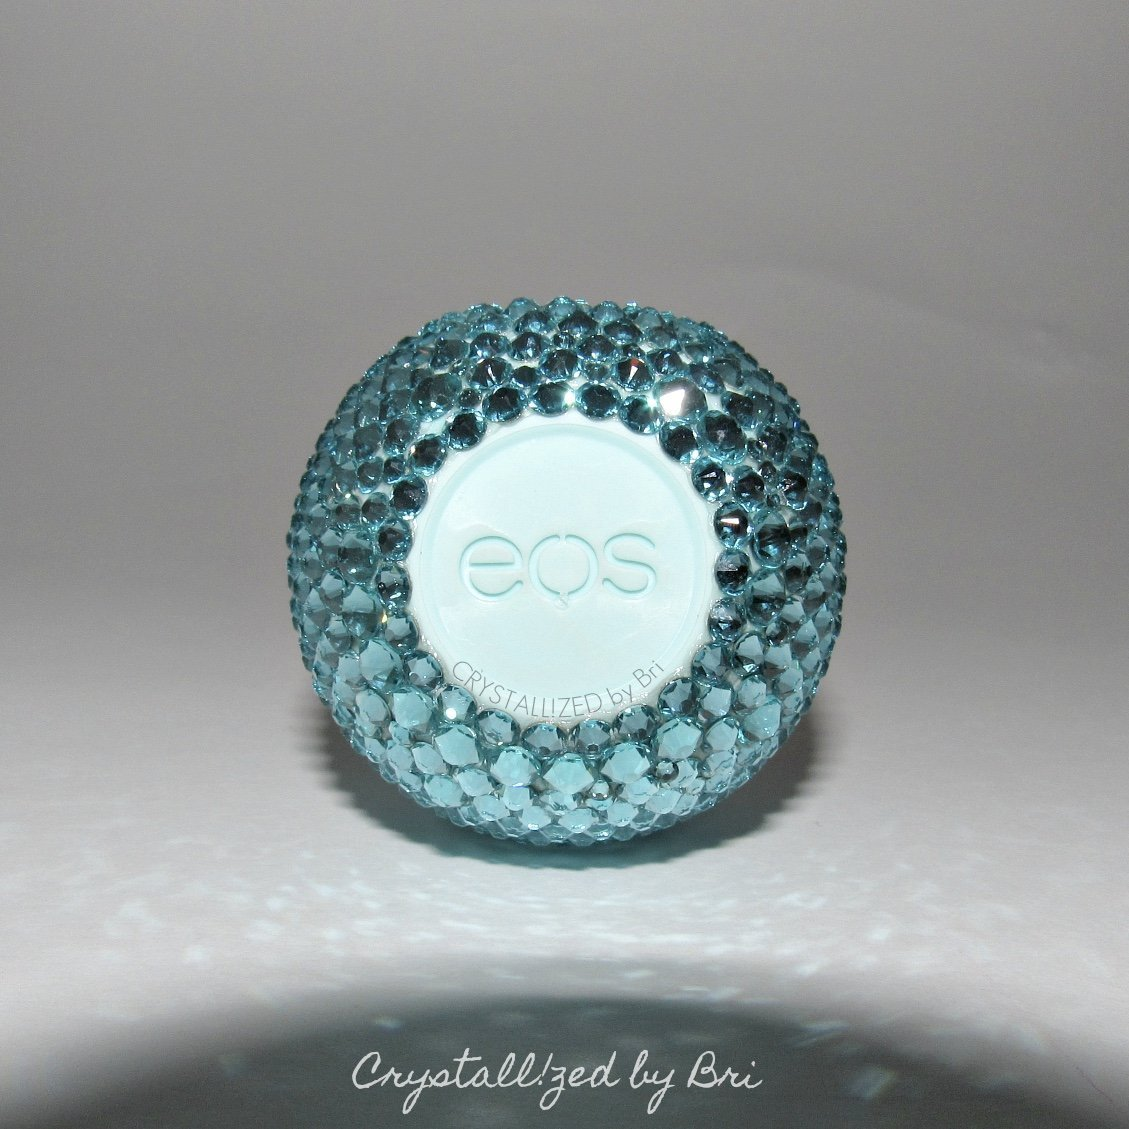 Amazon.com: CRYSTALLIZED eos Lip Balm Bling Hand Made with Swarovski ...